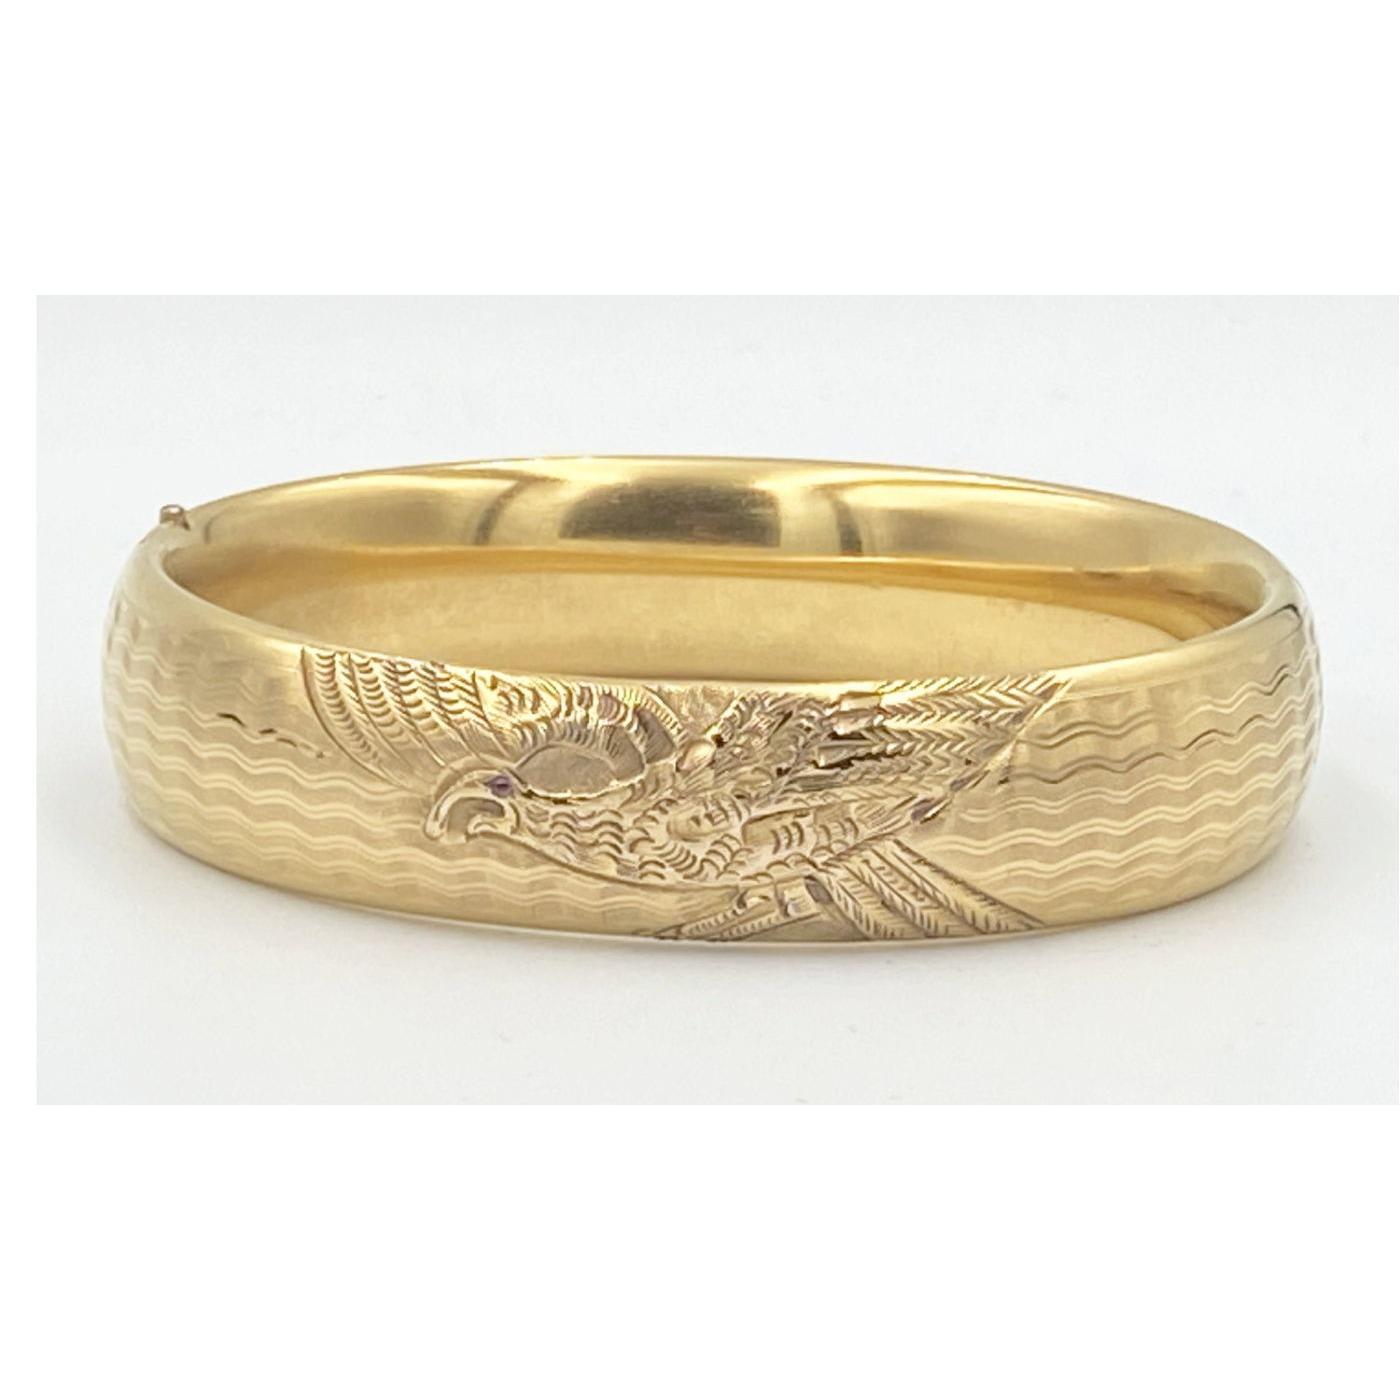 Scarce EAGLE Engraved All-Around Engagement Bangle